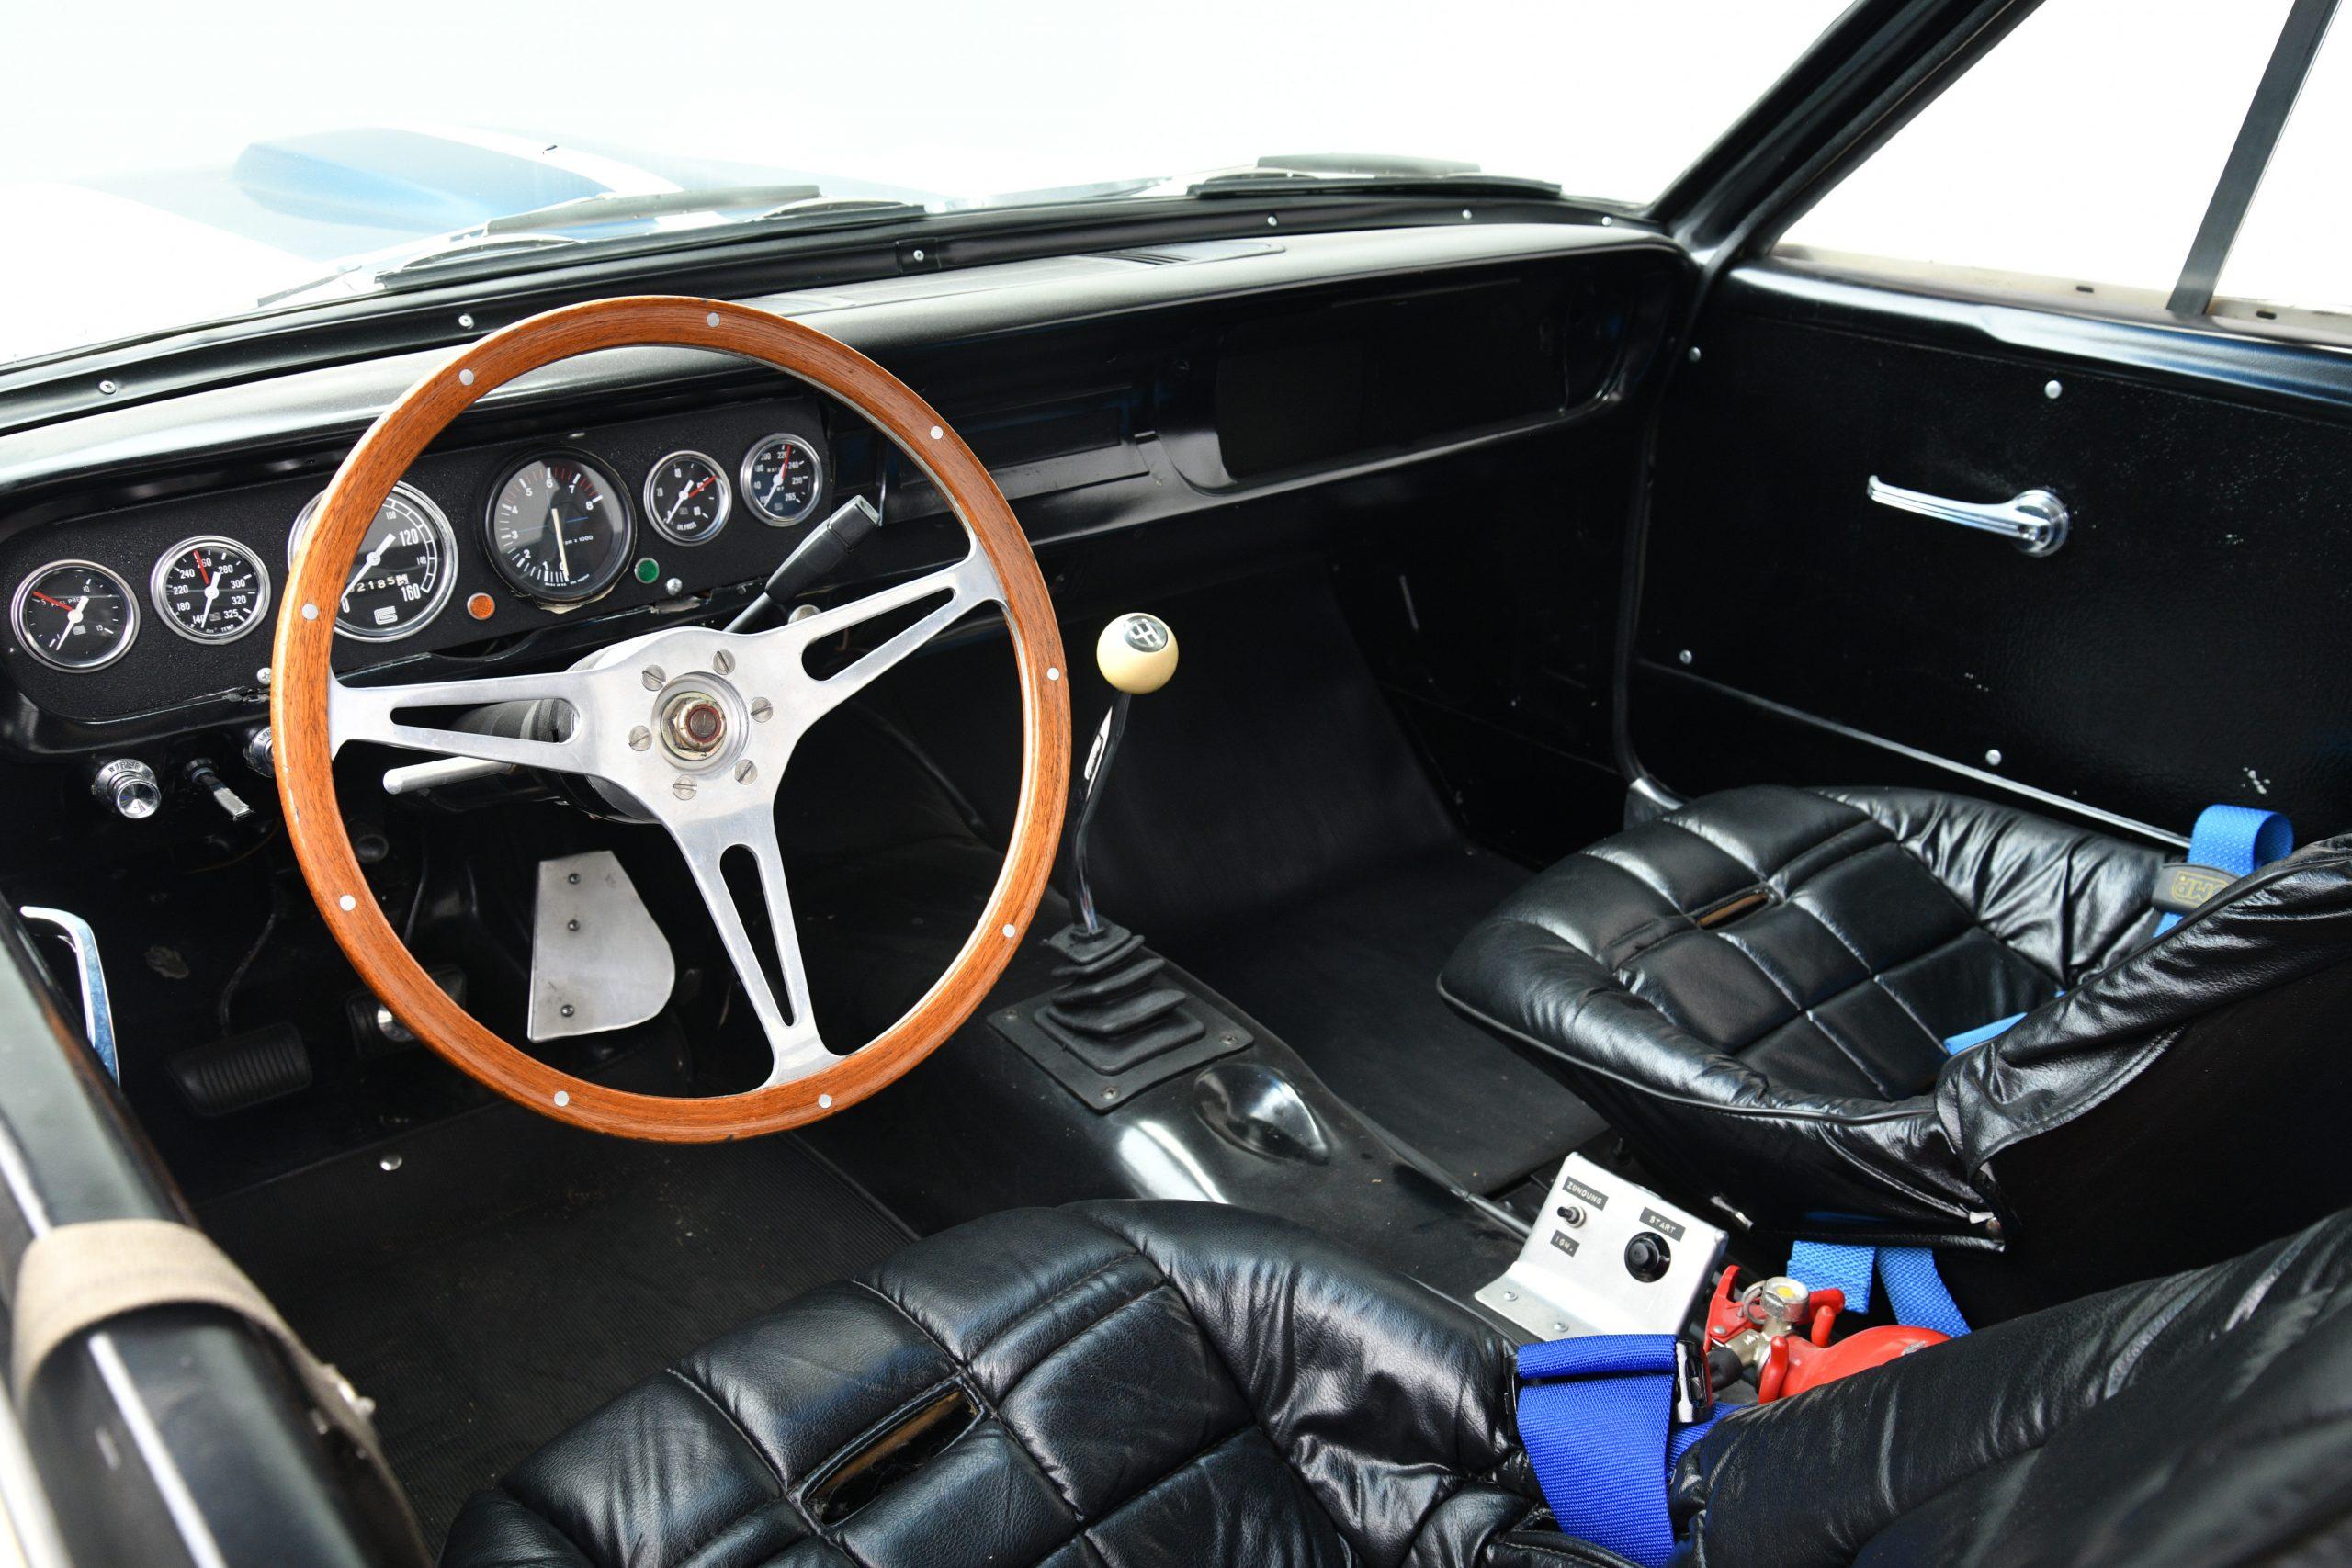 Sir Stirling Moss GT 350 interior